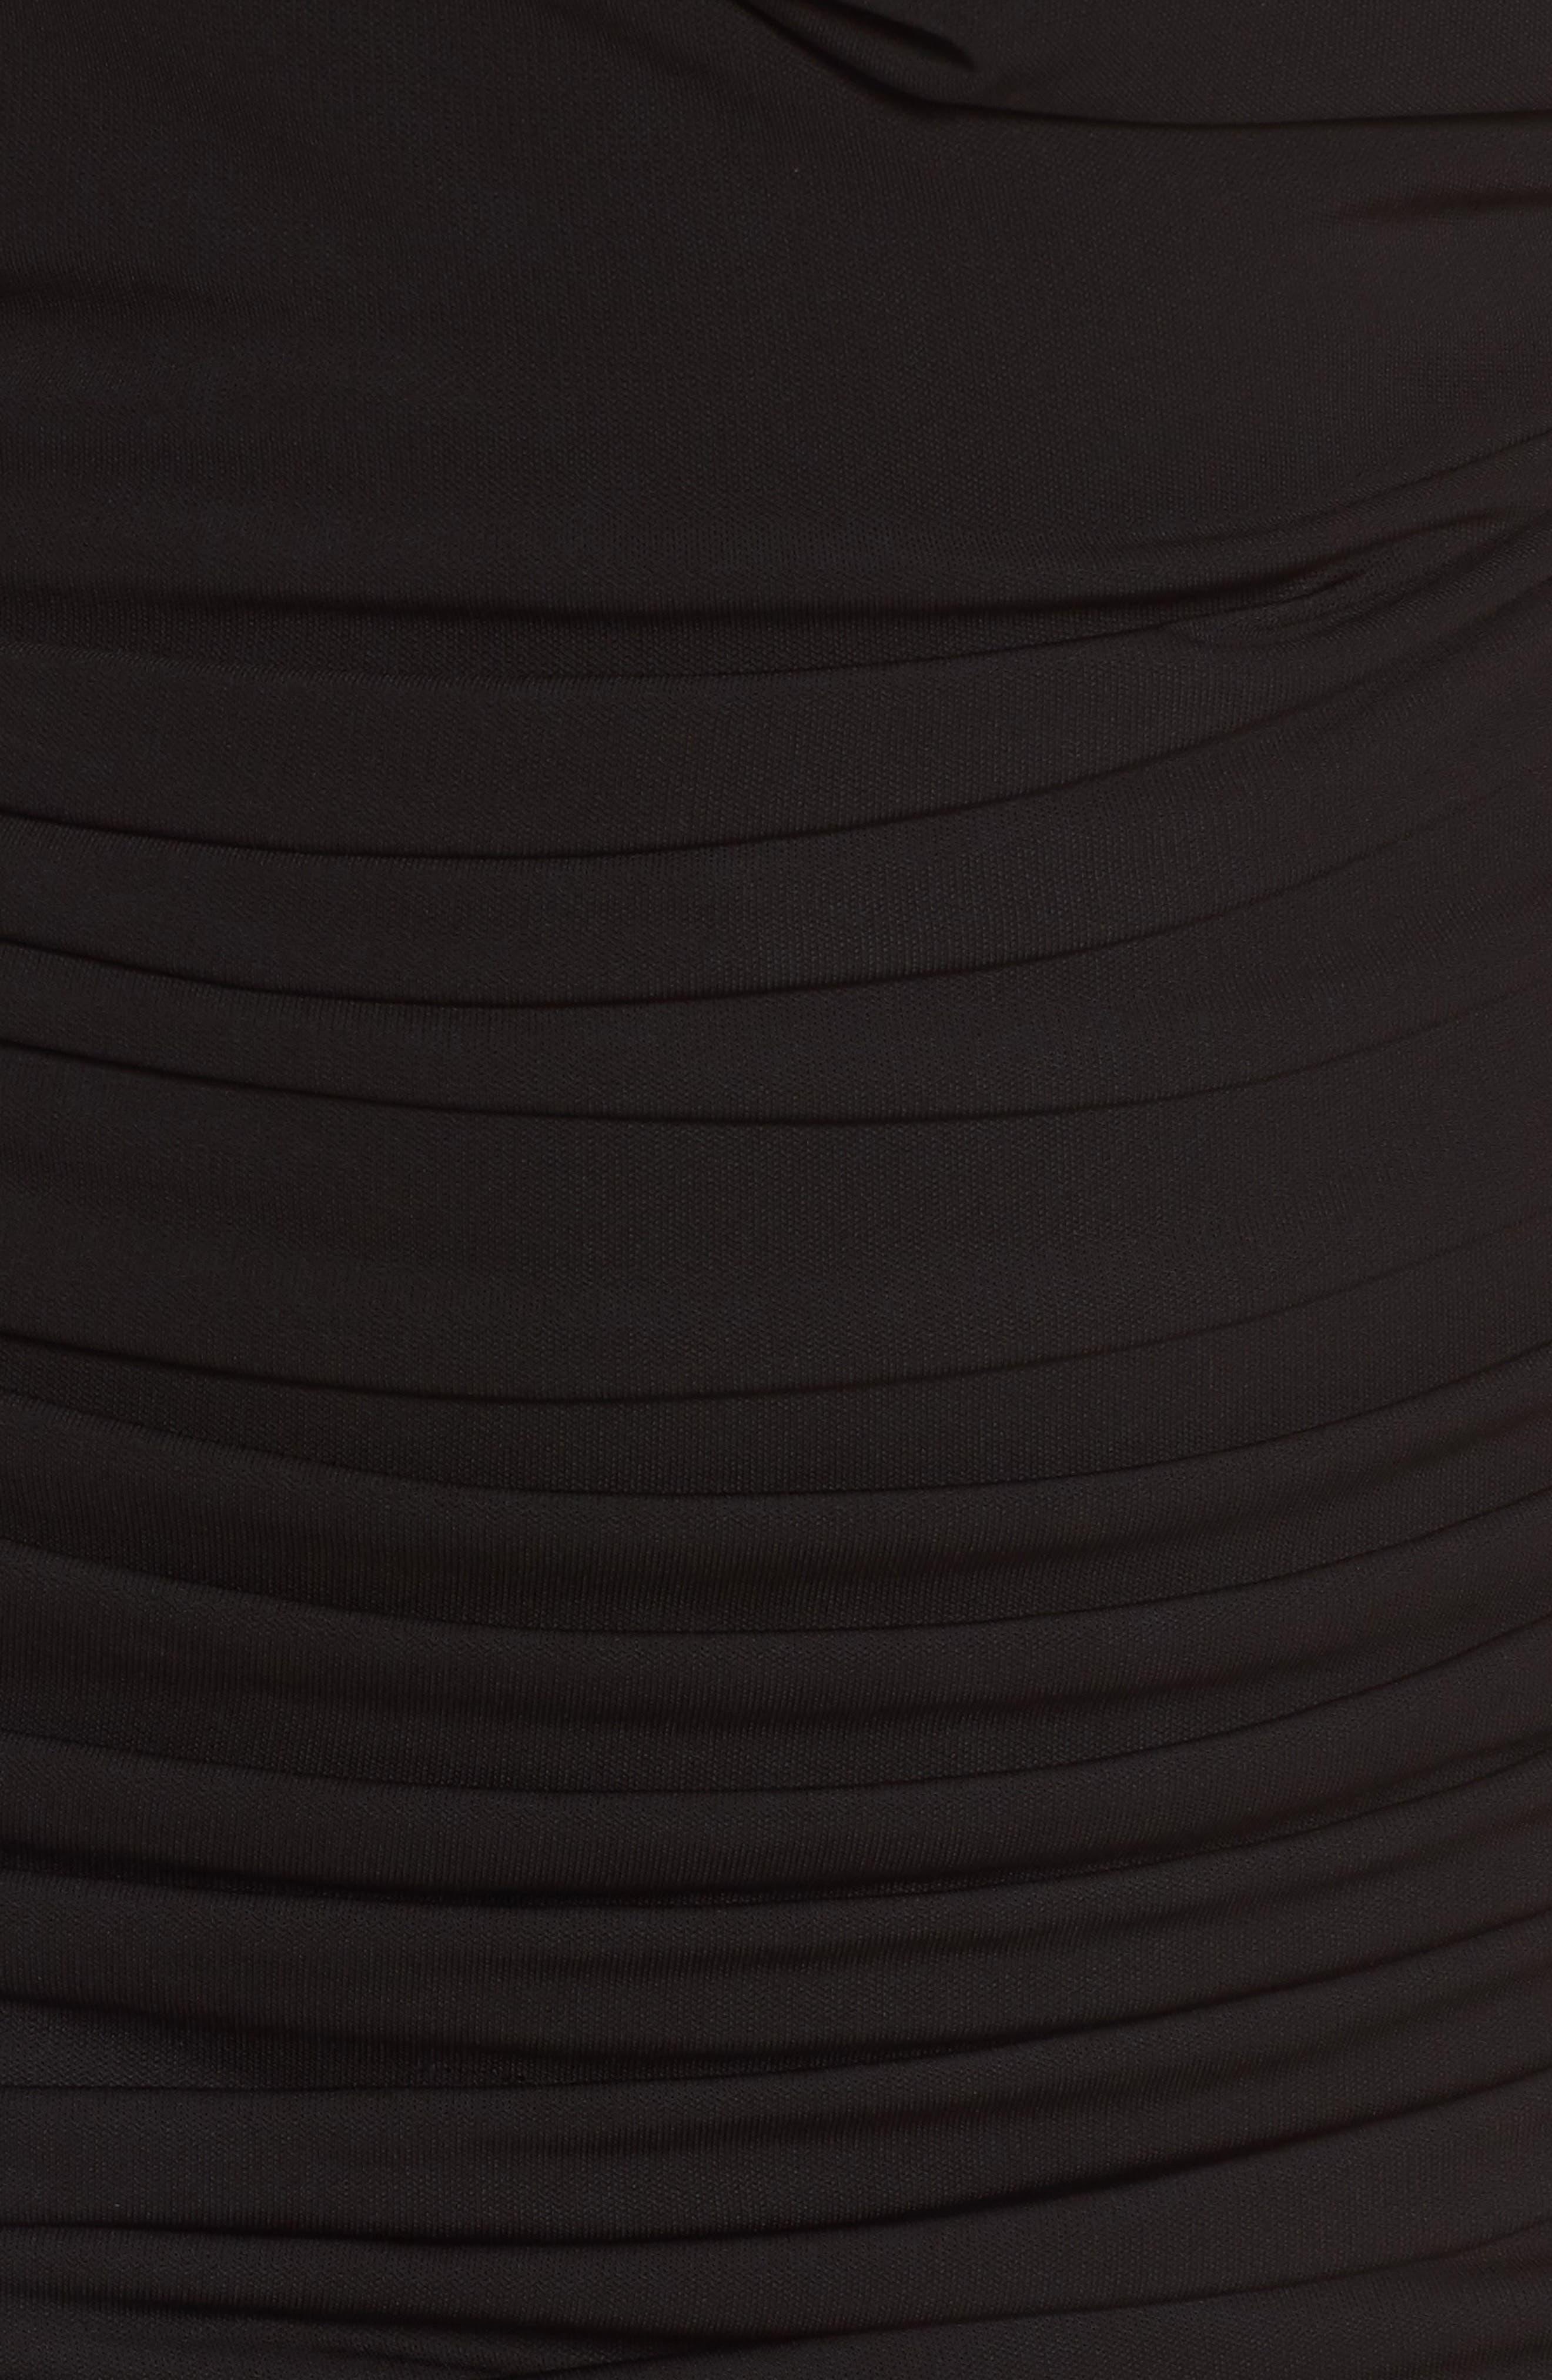 Off the Shoulder Twist Dress,                             Alternate thumbnail 5, color,                             Black